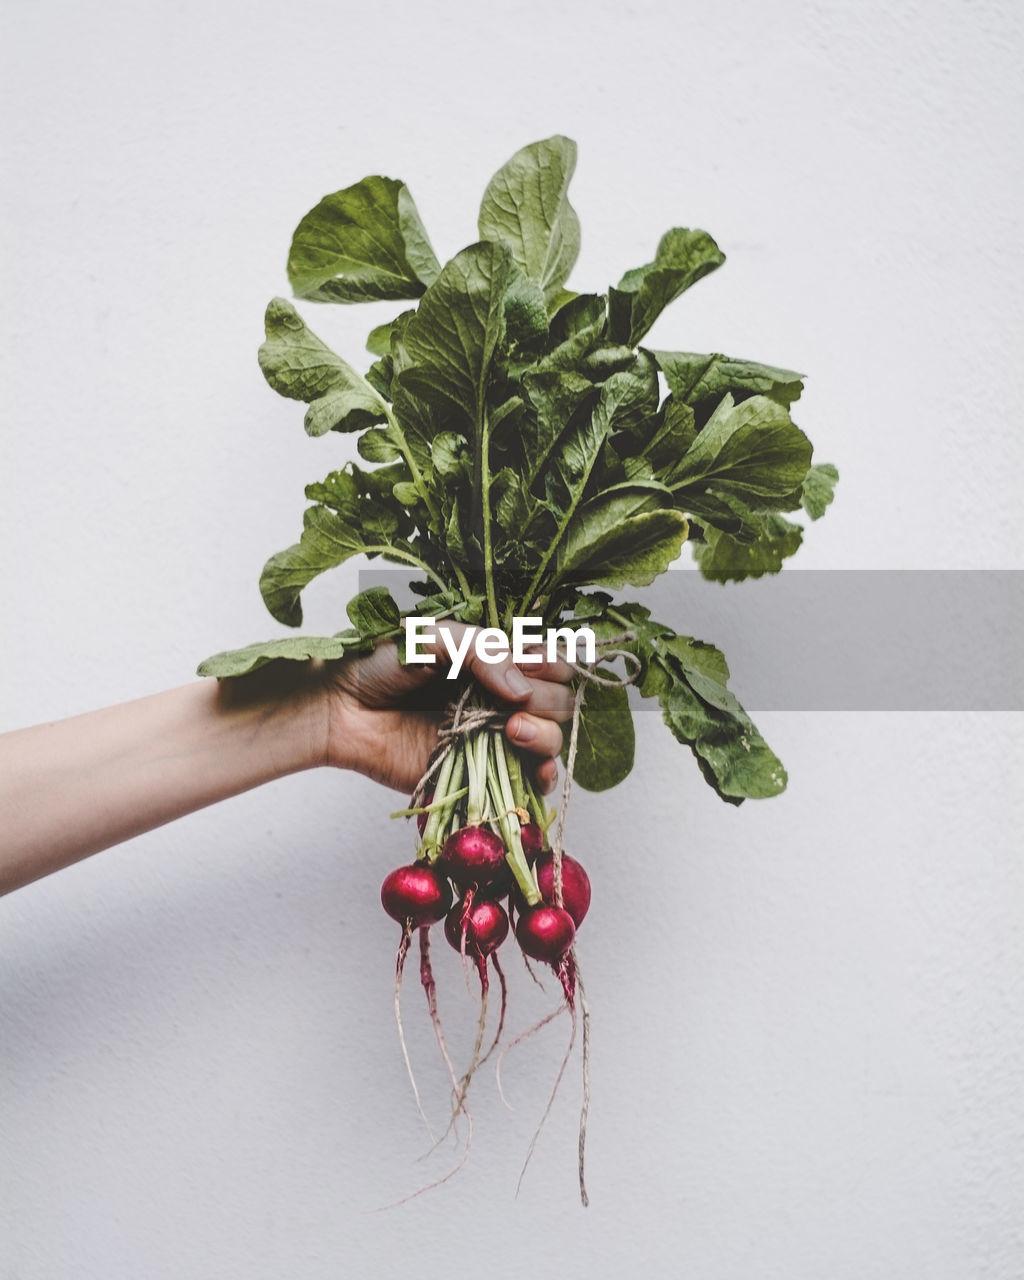 Cropped hand holding radishes against white background